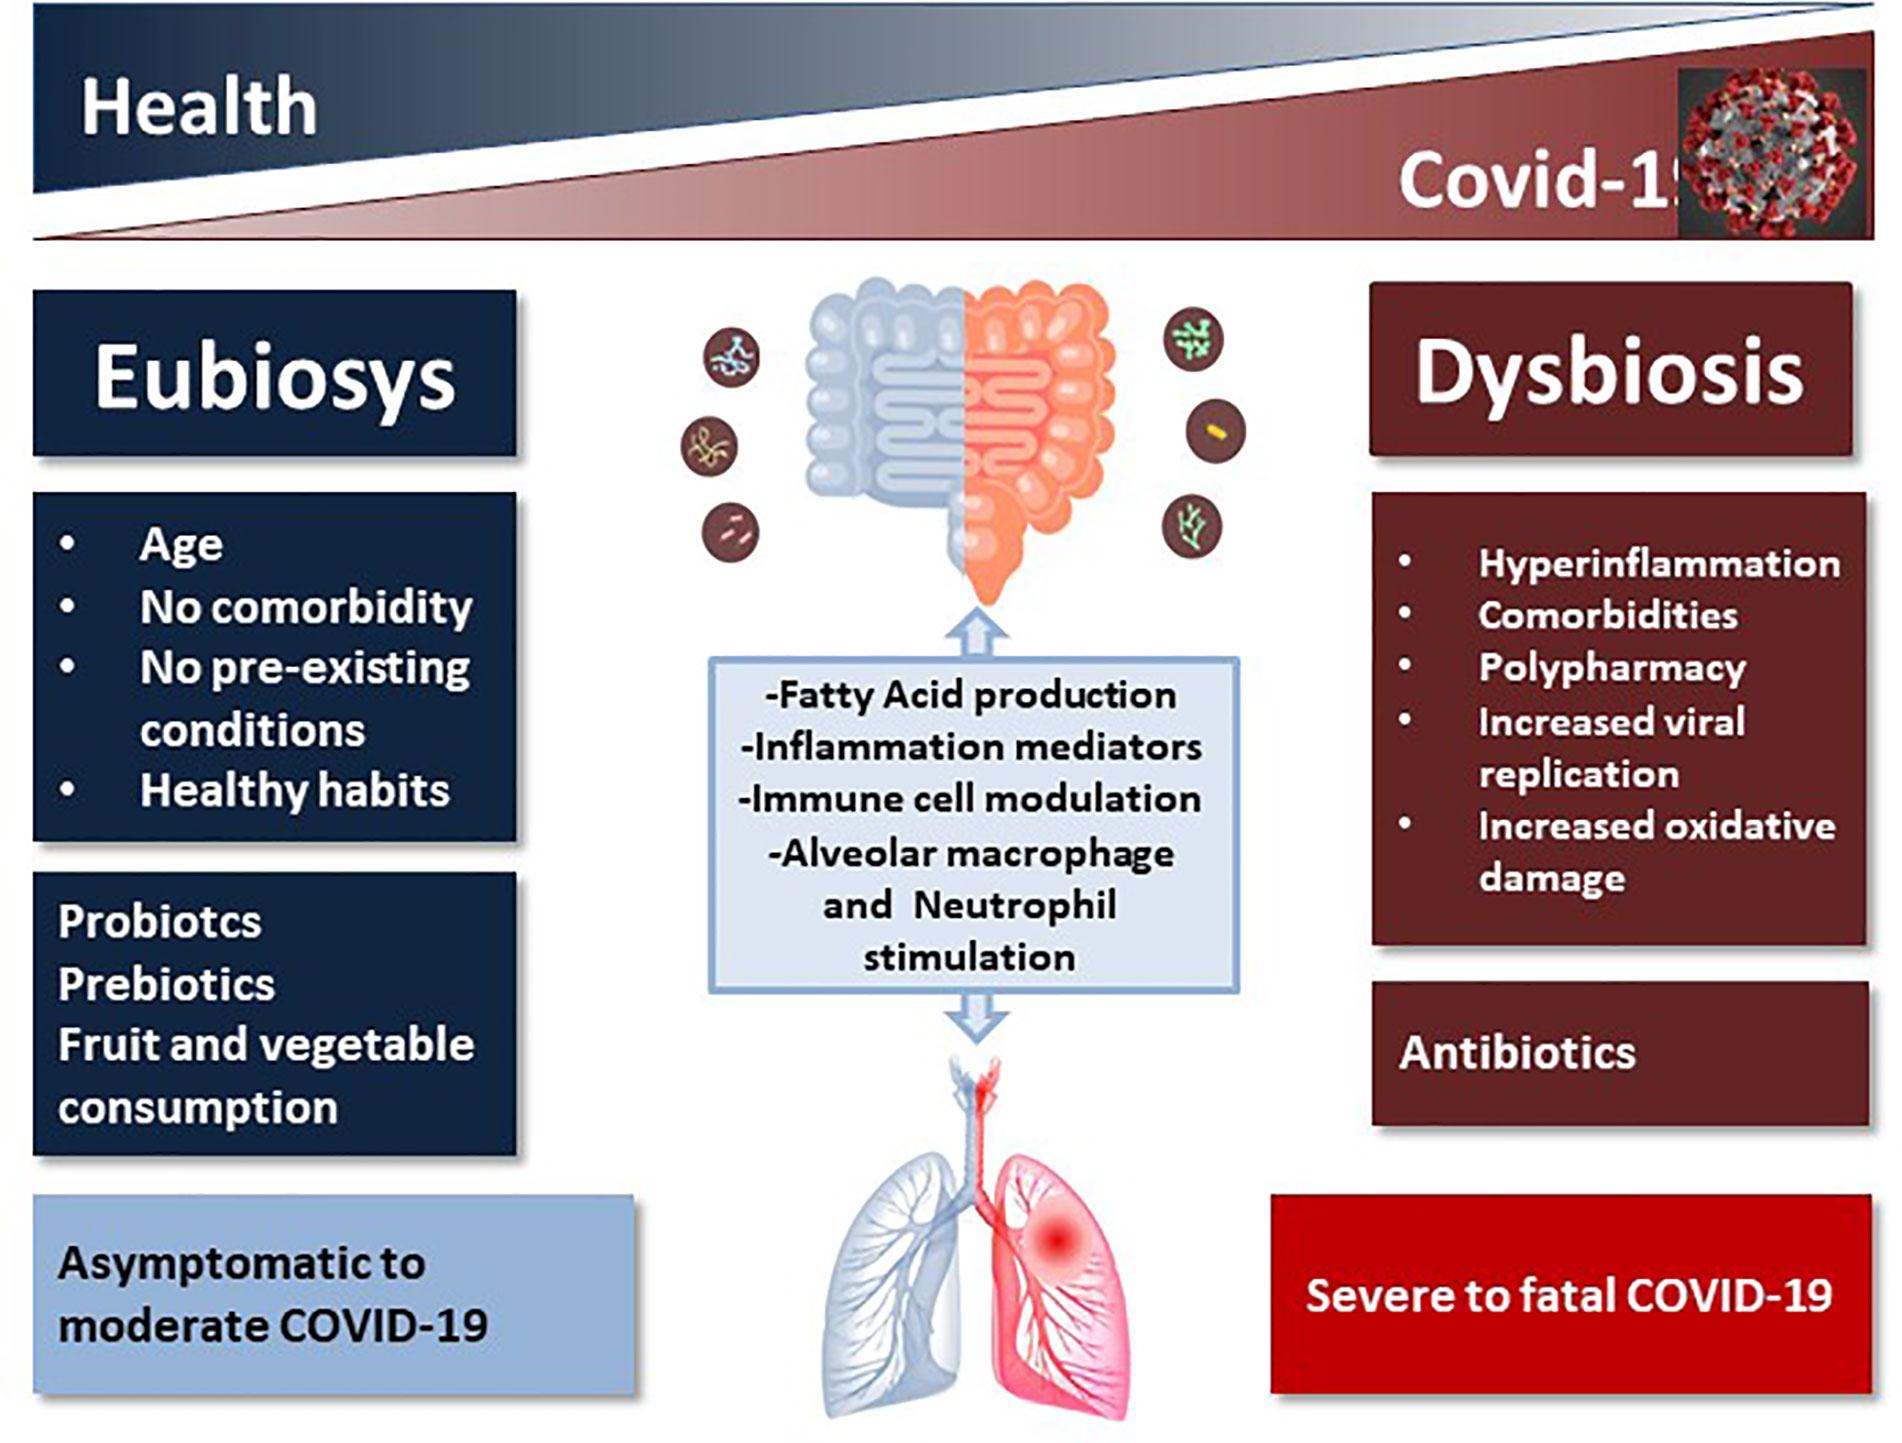 Dysbiosis lps - Dysbiosis lps. disbacterioza